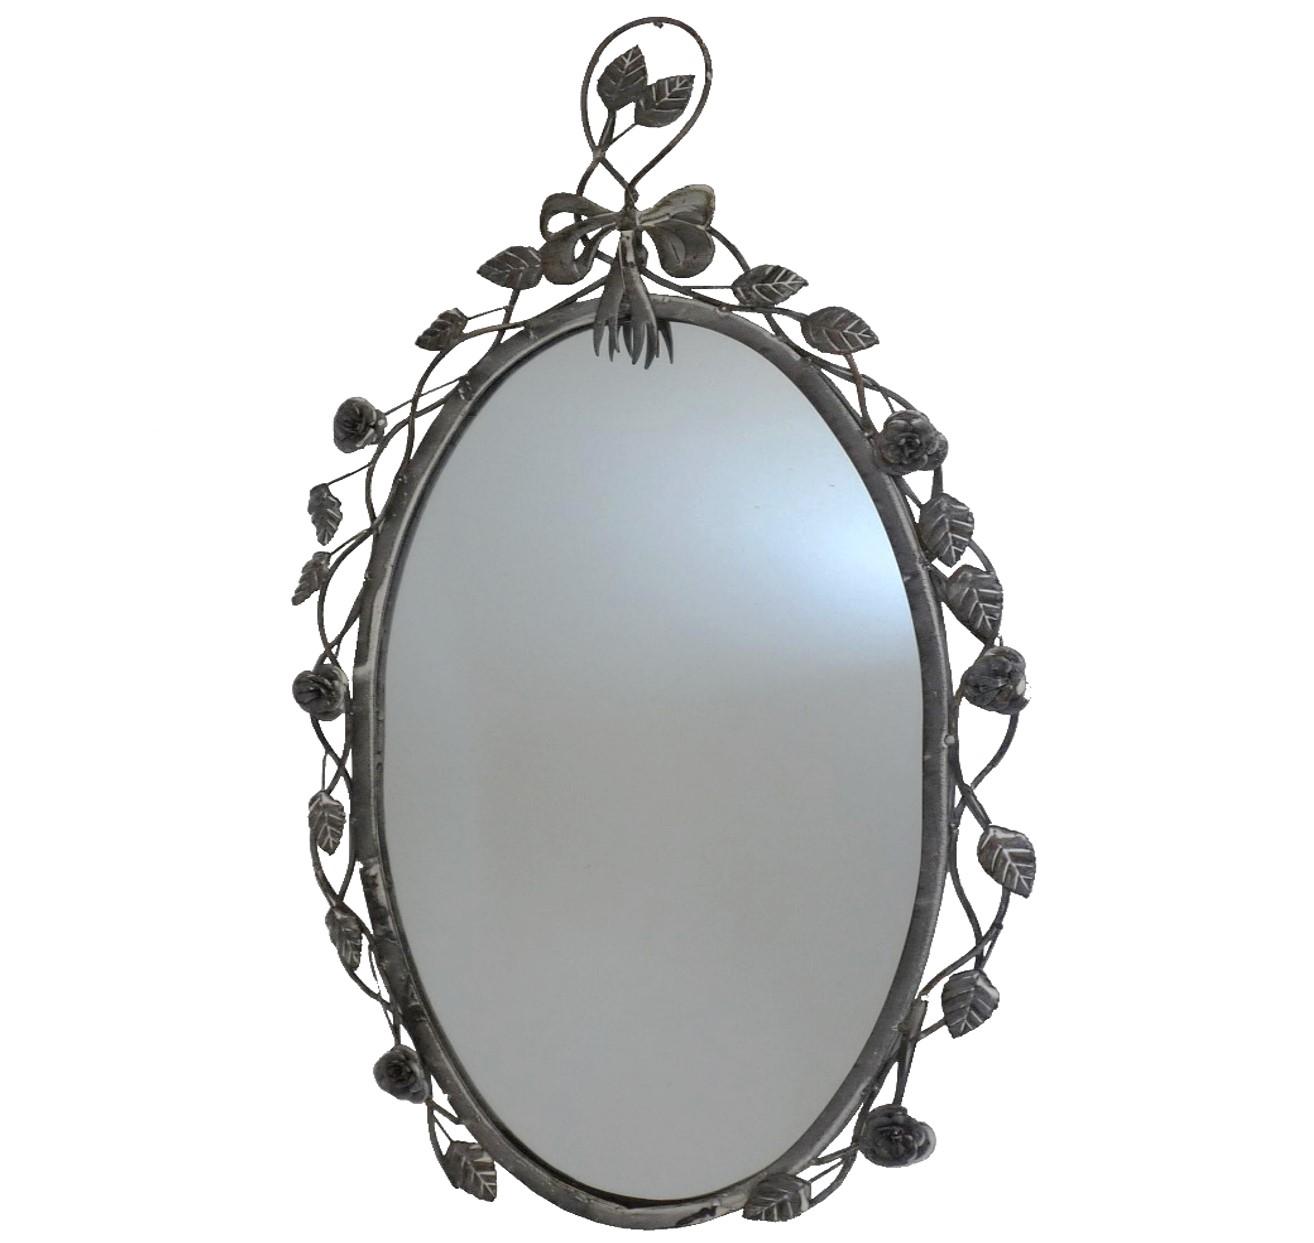 Style ancien miroir metal fer ovale gris avec rose mural for Miroir salle de bain chauffant